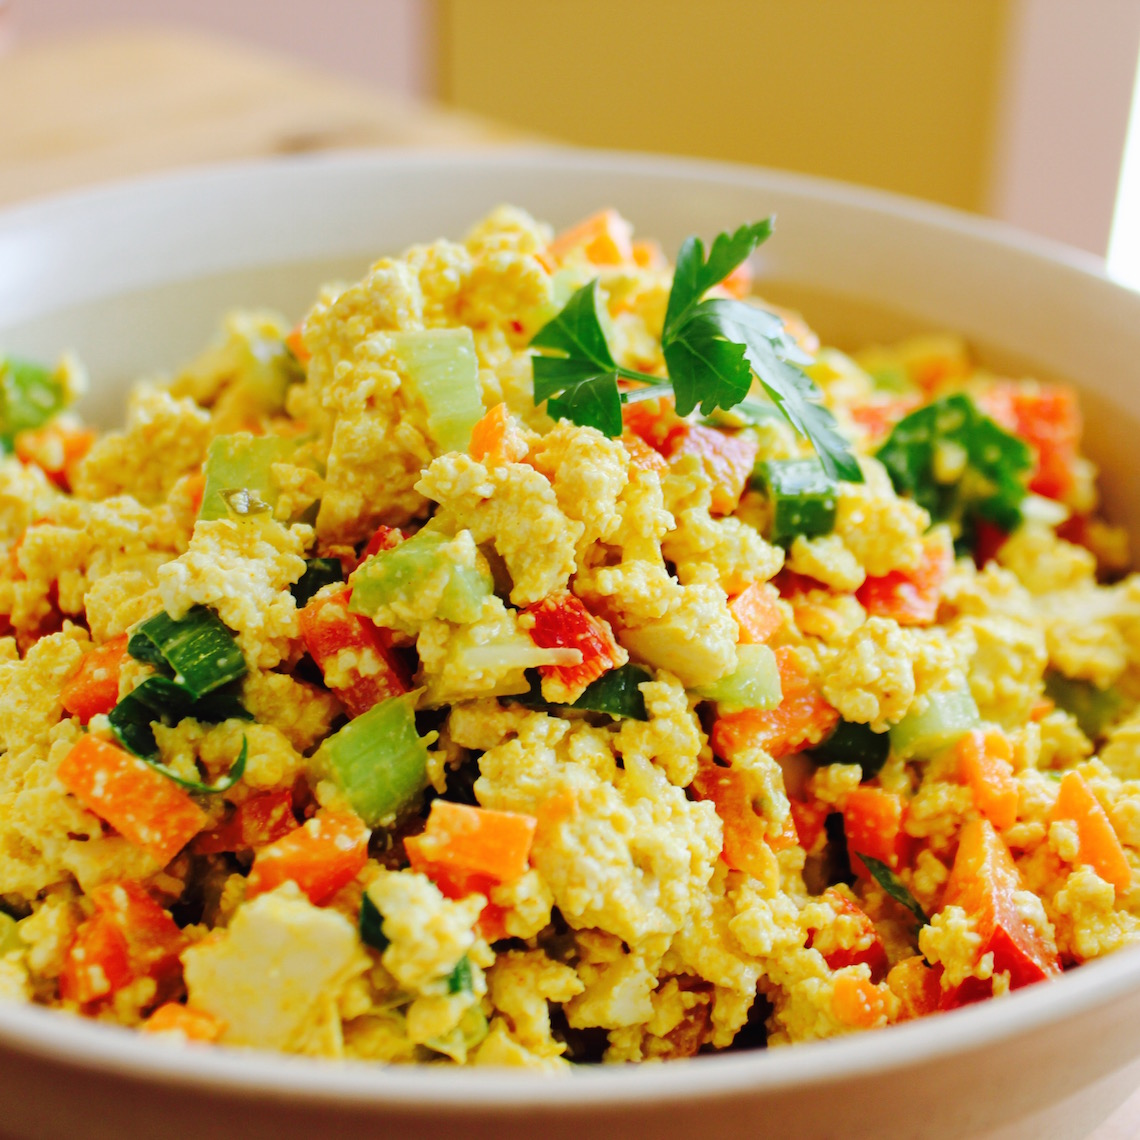 Egg-less Salad Sandwich